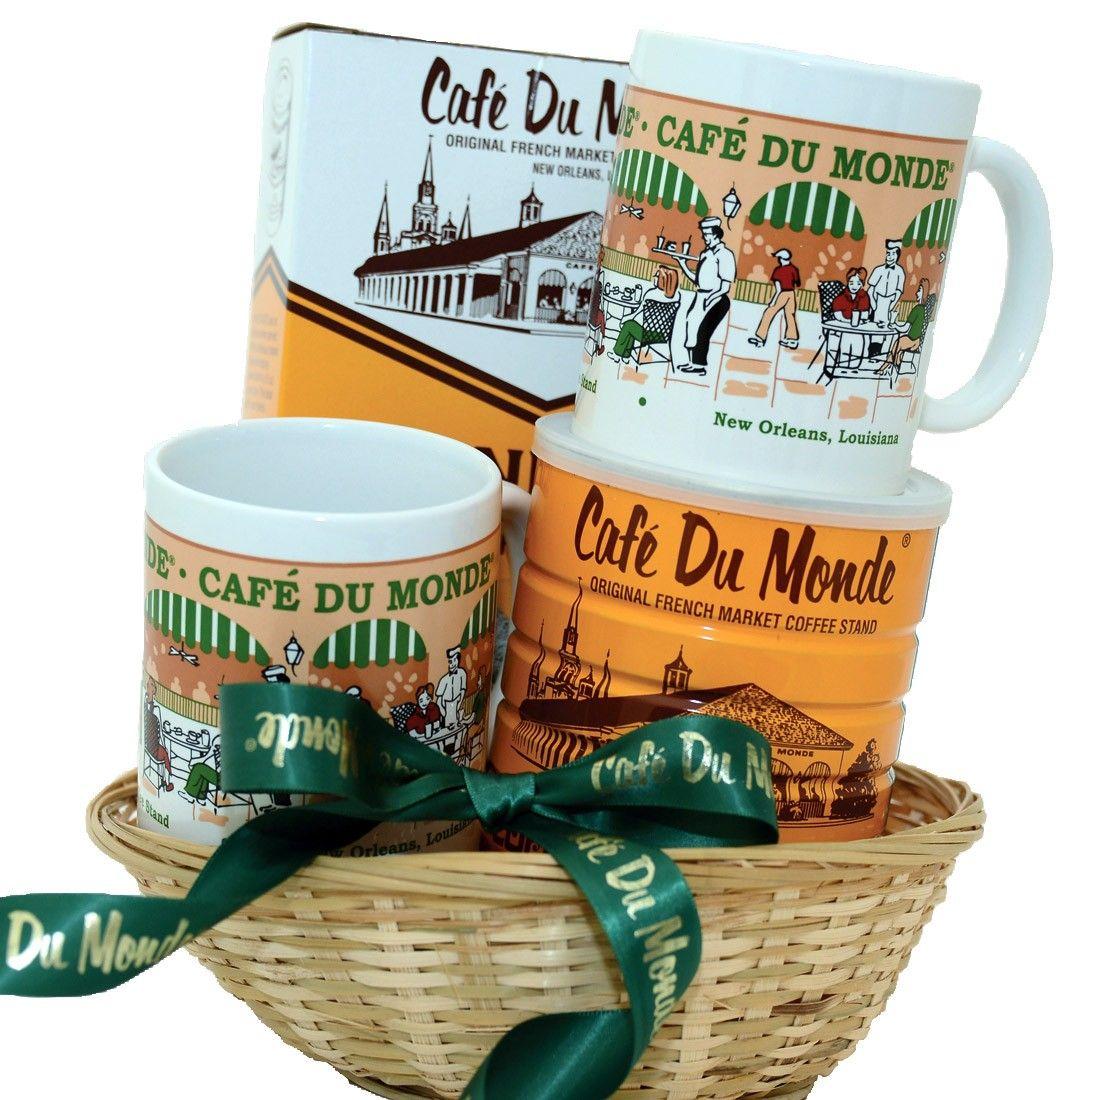 Decatur St. Gift Basket Coffee stands, The originals